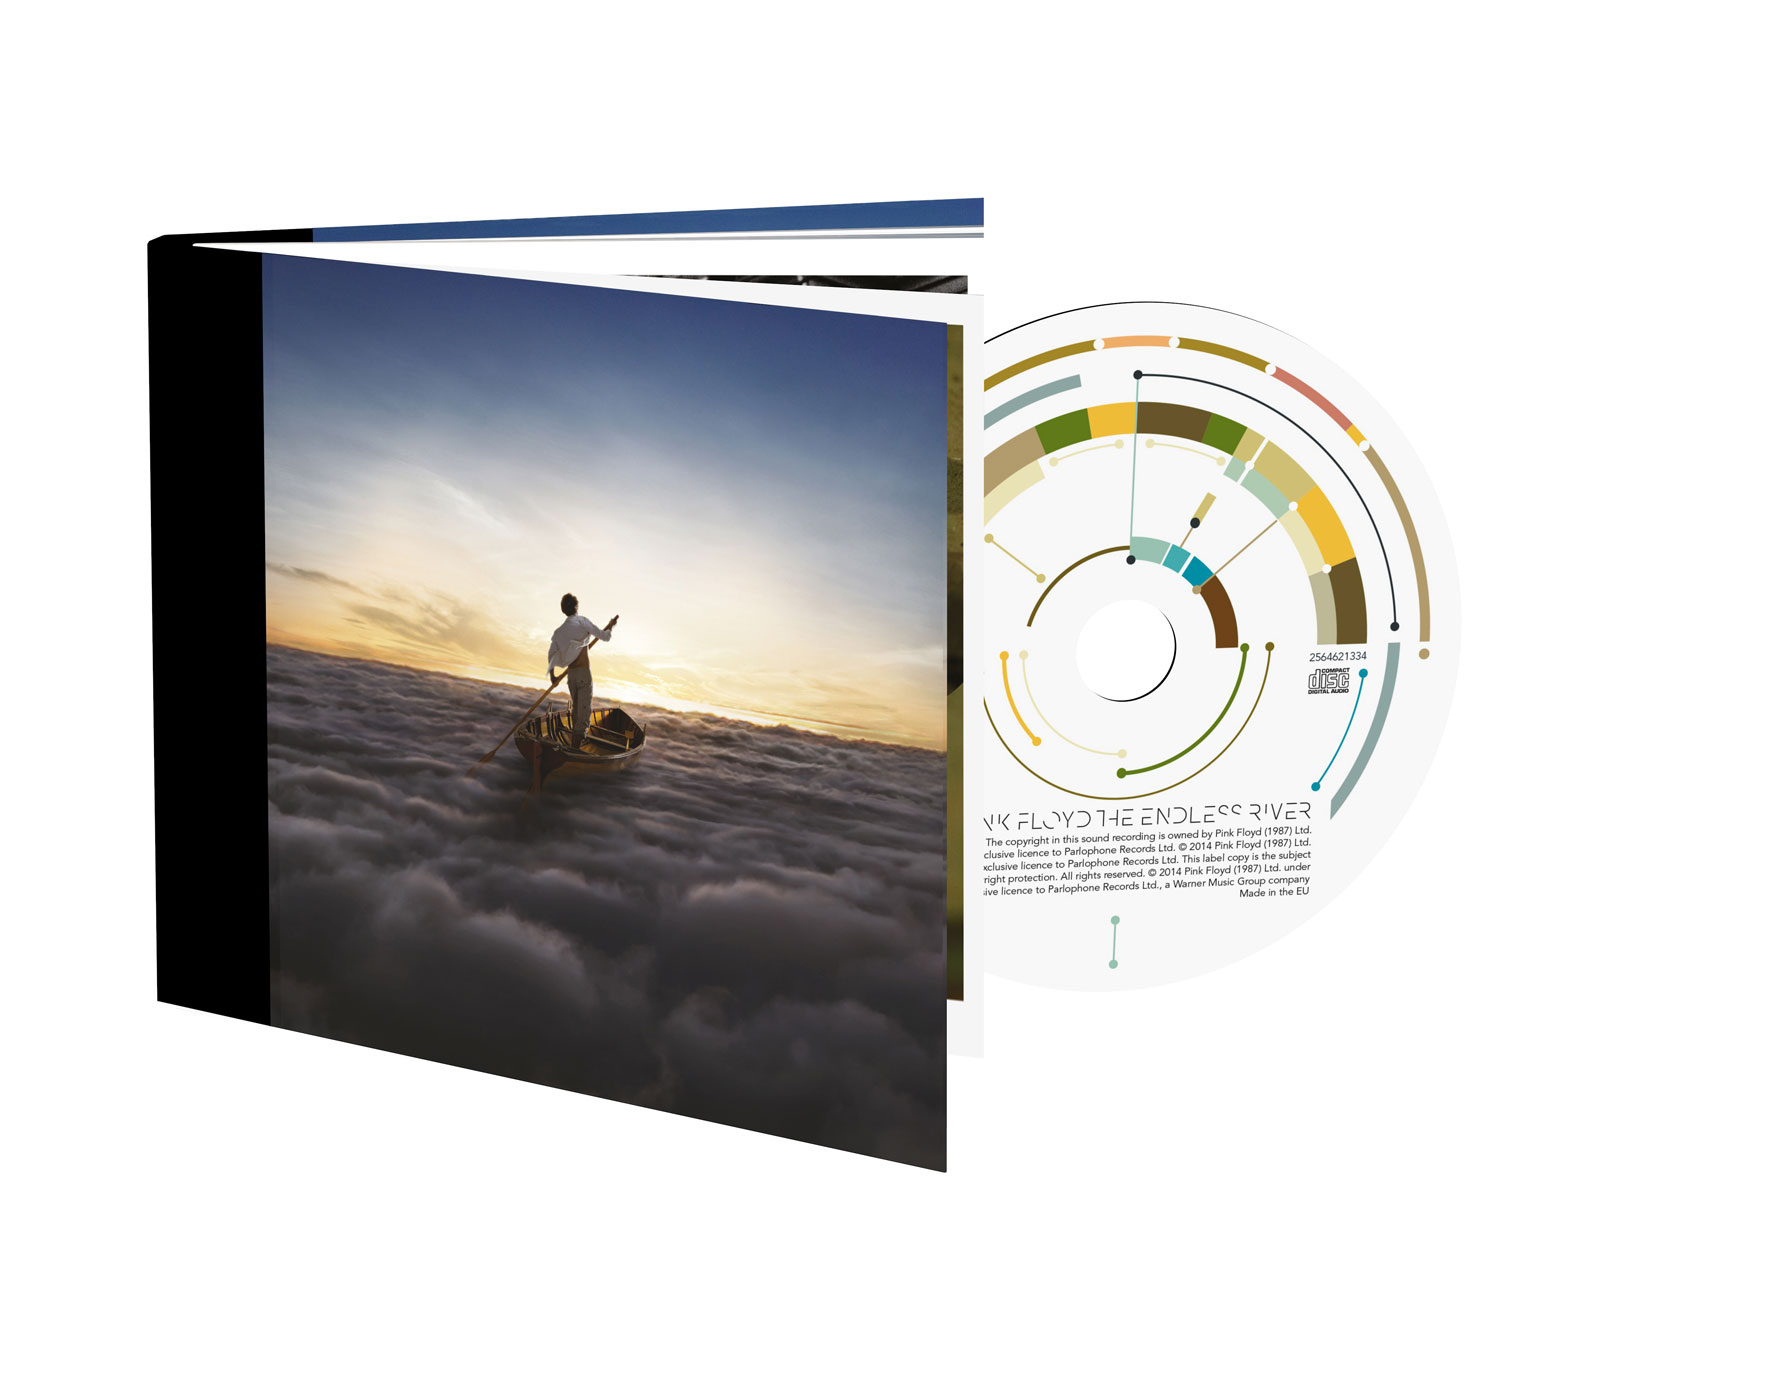 cd image 1